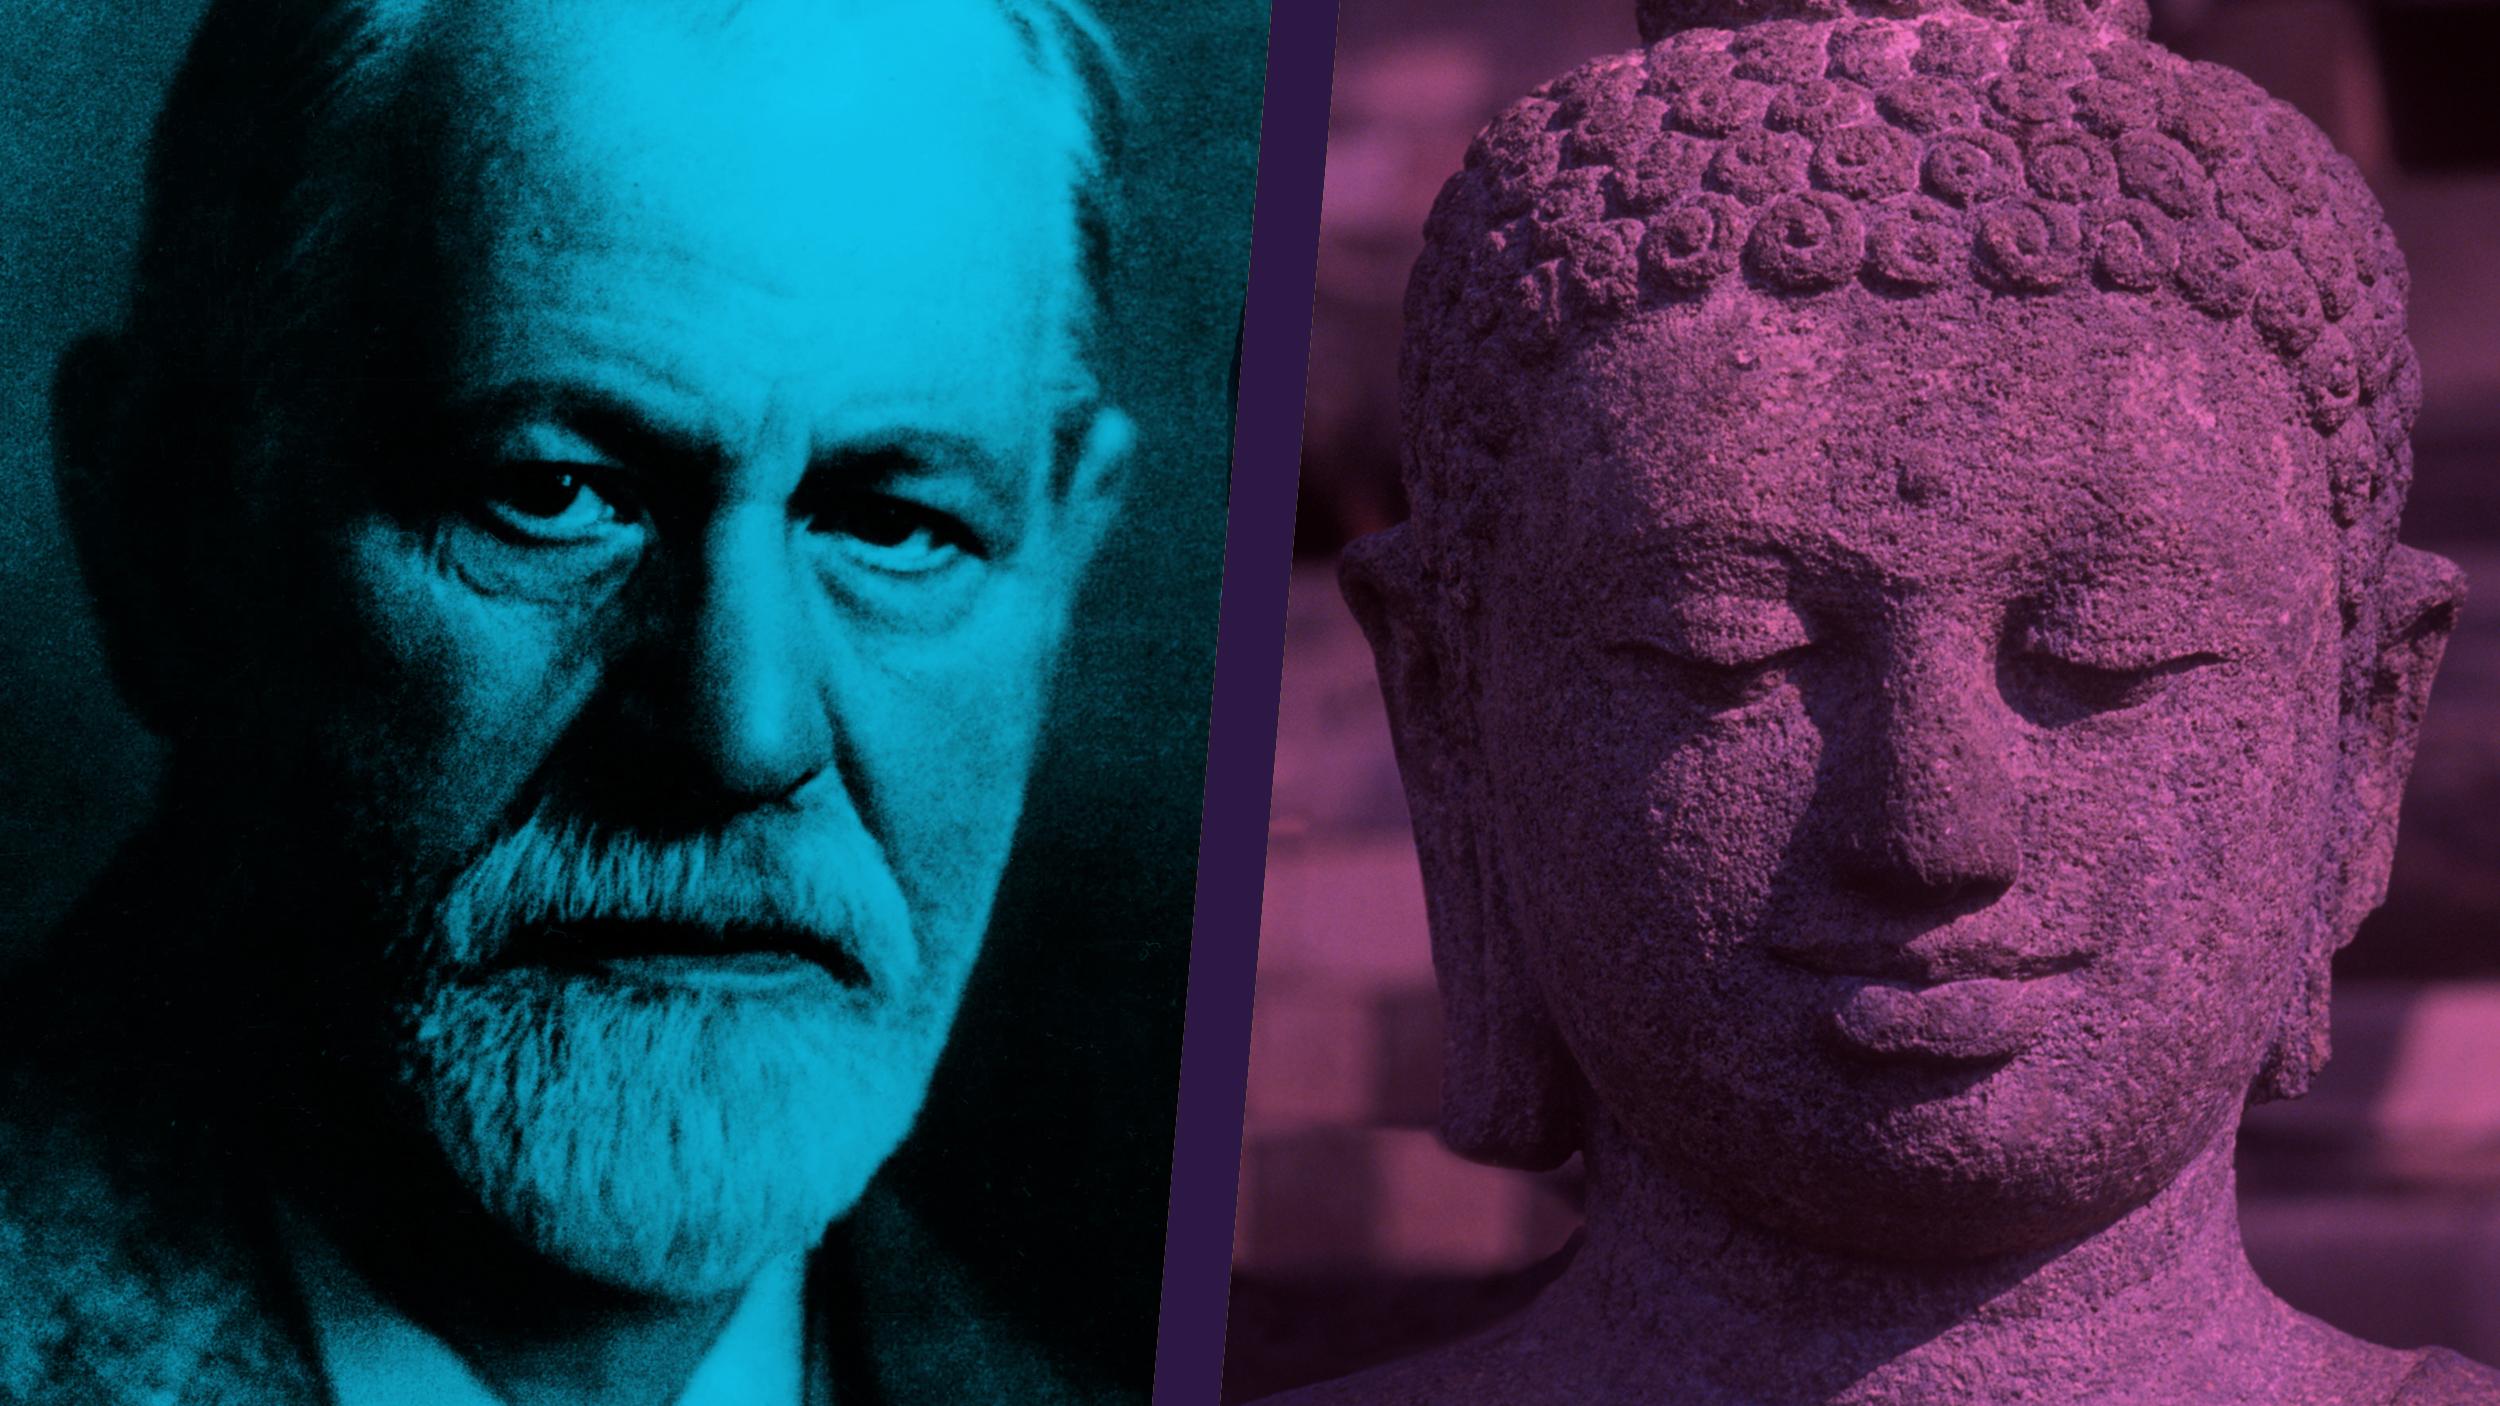 فروید و بودا: کاناپه و کوسن